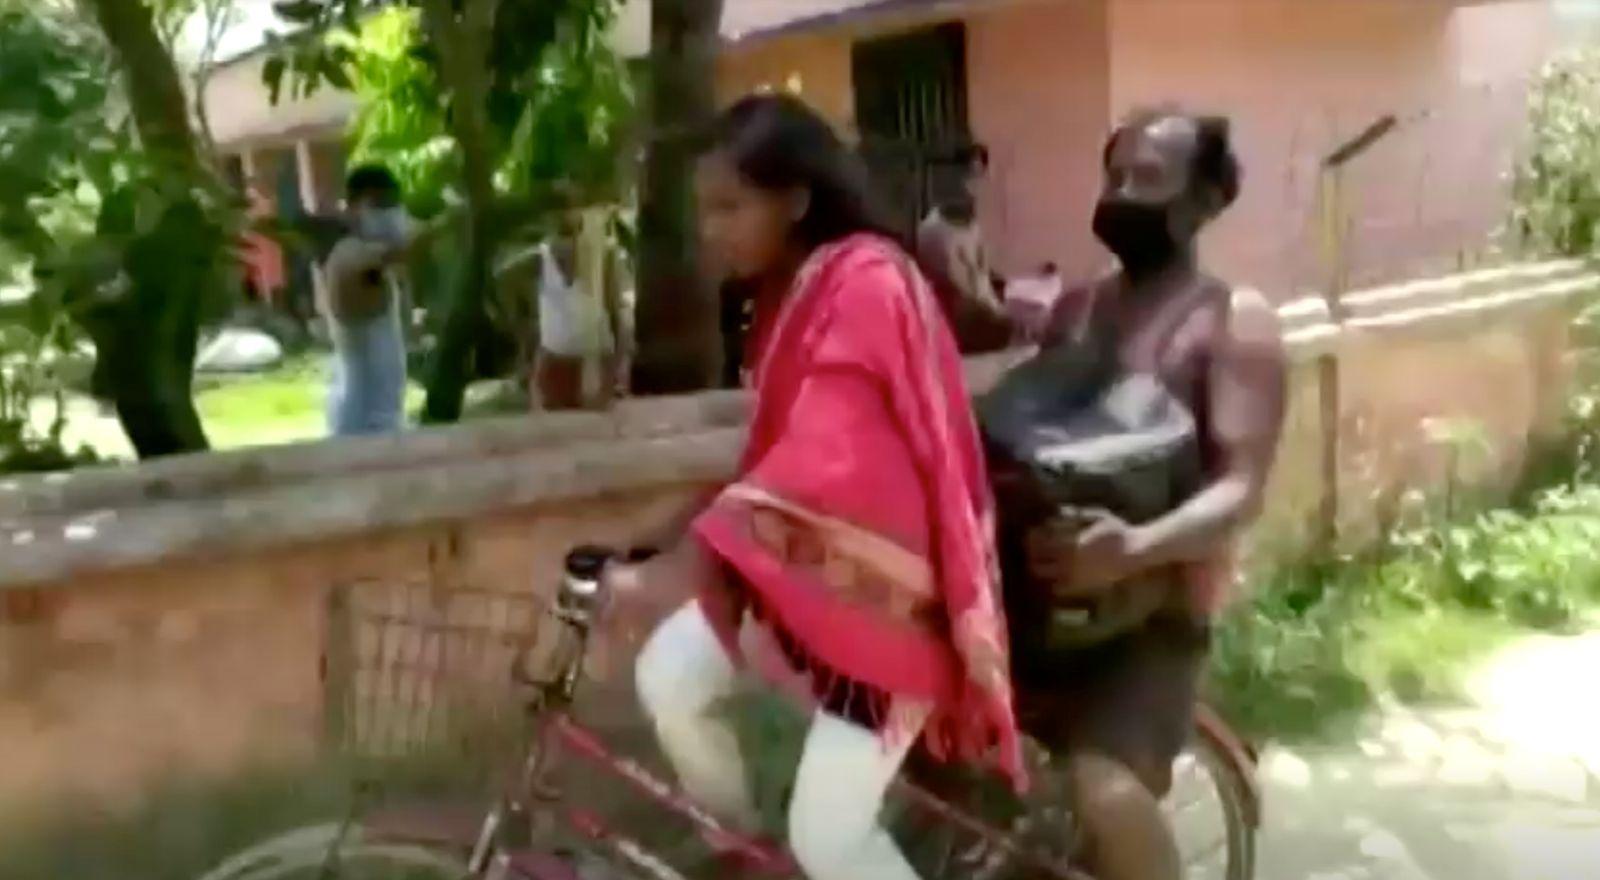 Jyoti Kumari carries her father on the back of her bicycle, in Darbhanga